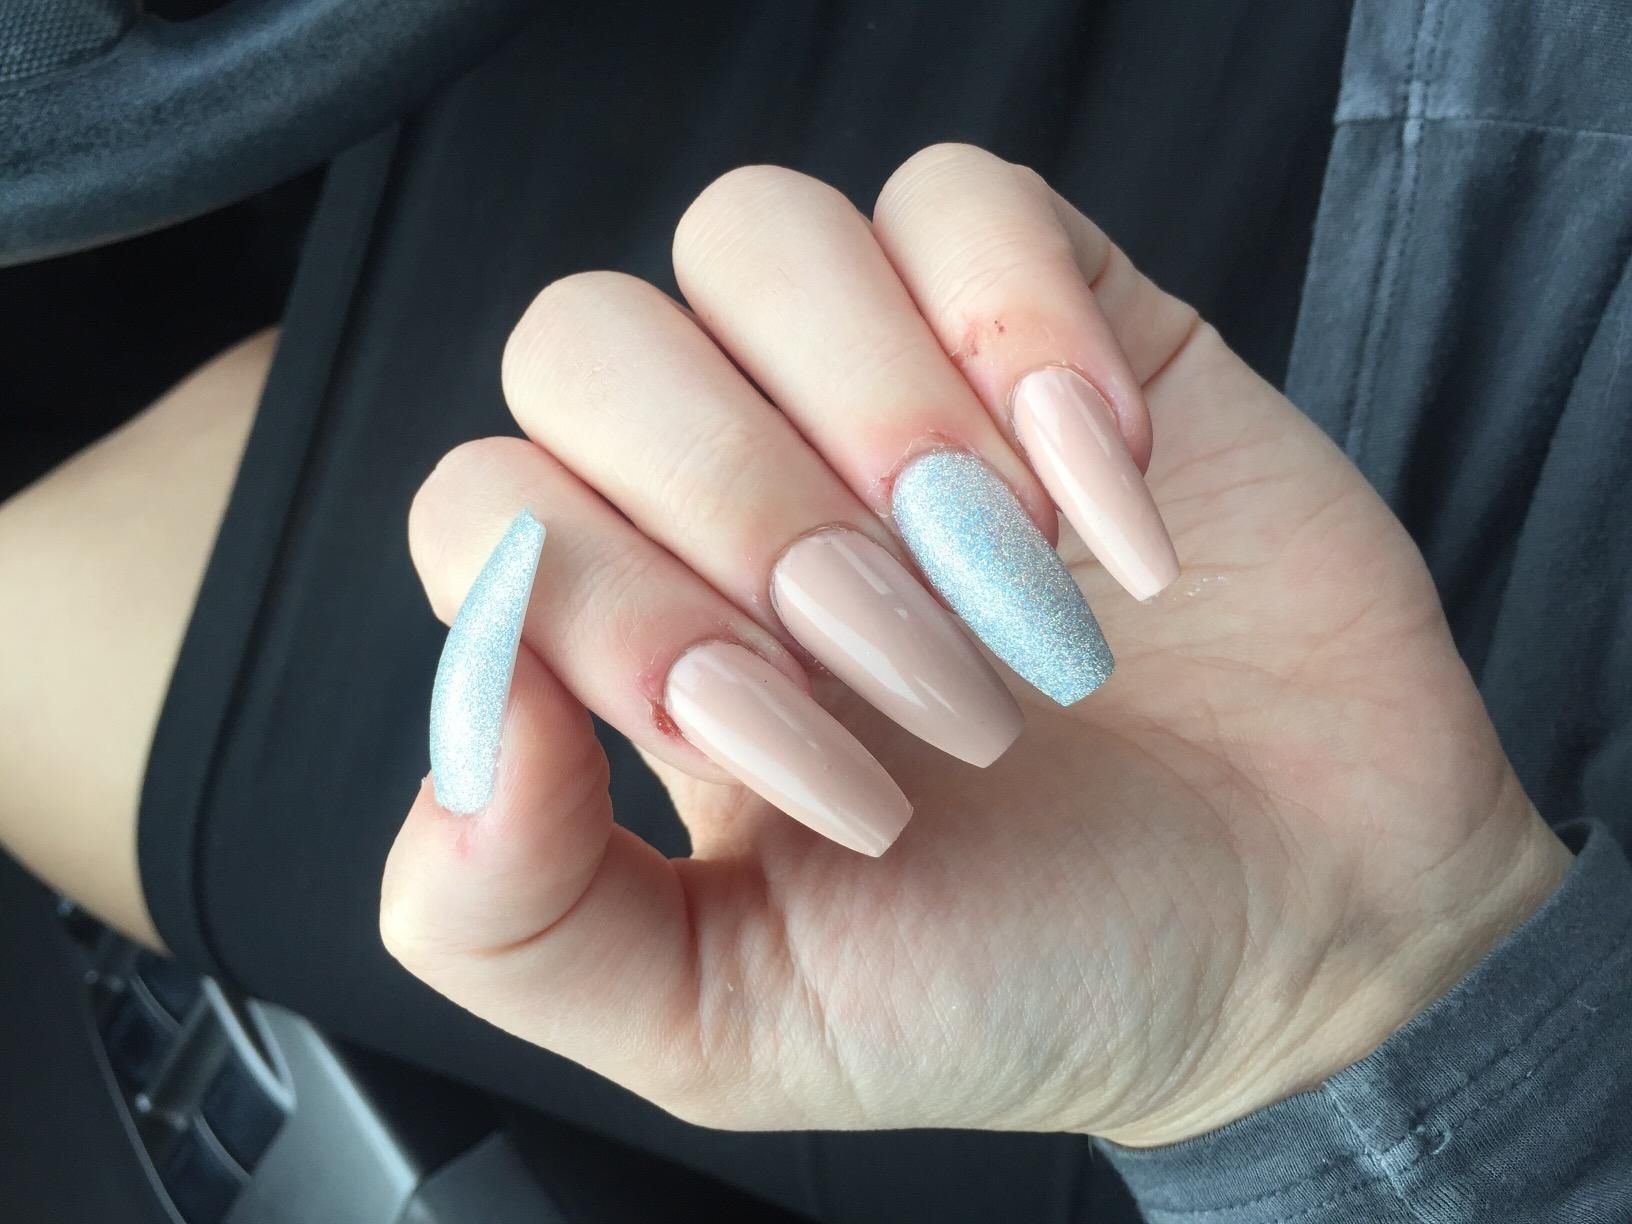 Amazon.com: Makartt 500pcs Coffin Nails Clear Ballerina Nail Tips ...